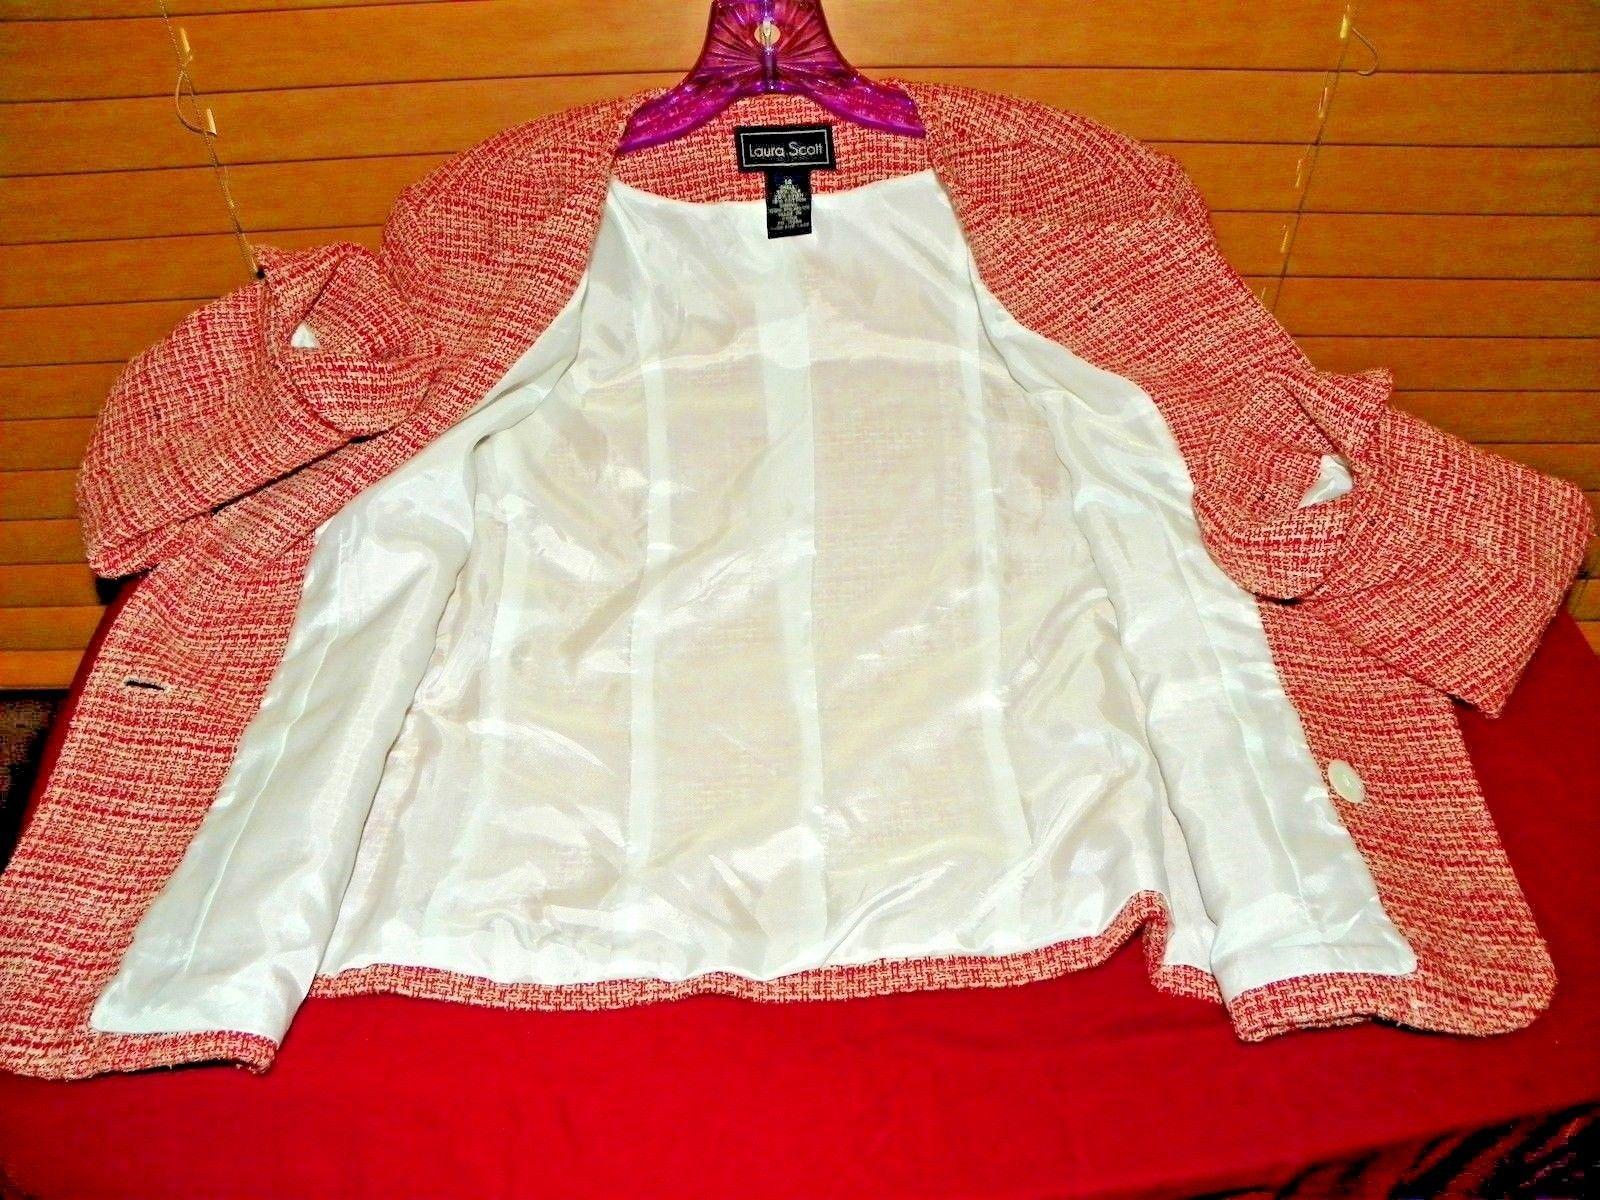 LAURA SCOTT SILK LINEN BLEND TWEED WOMEN'S SUIT JACKET RED WHITE SIZE 14 L@@K!!!